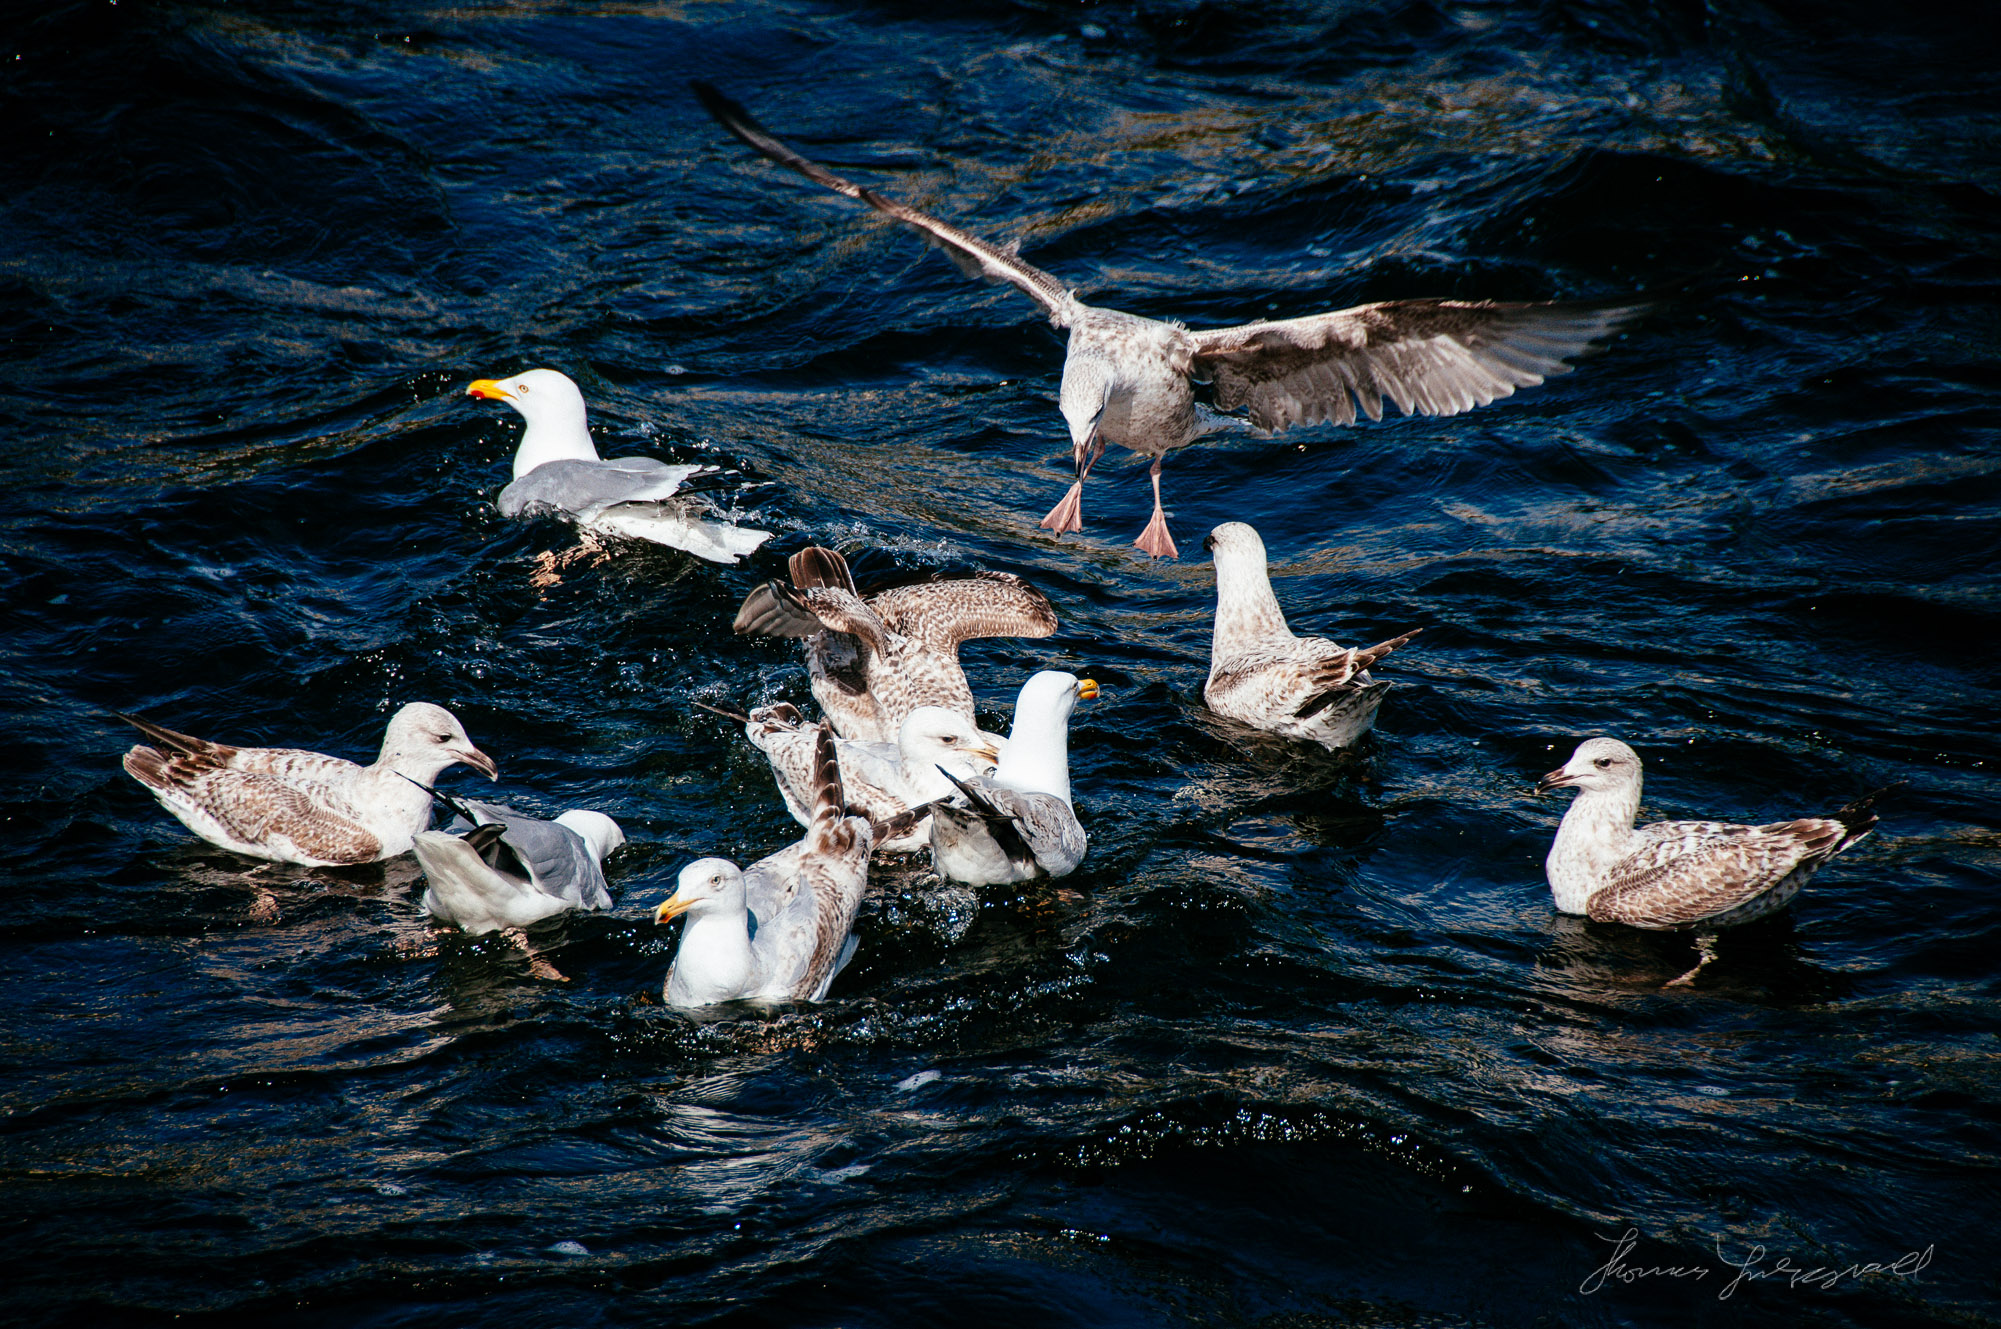 Seagulls Feeding in the river corrib that runs through galway city in Ireland